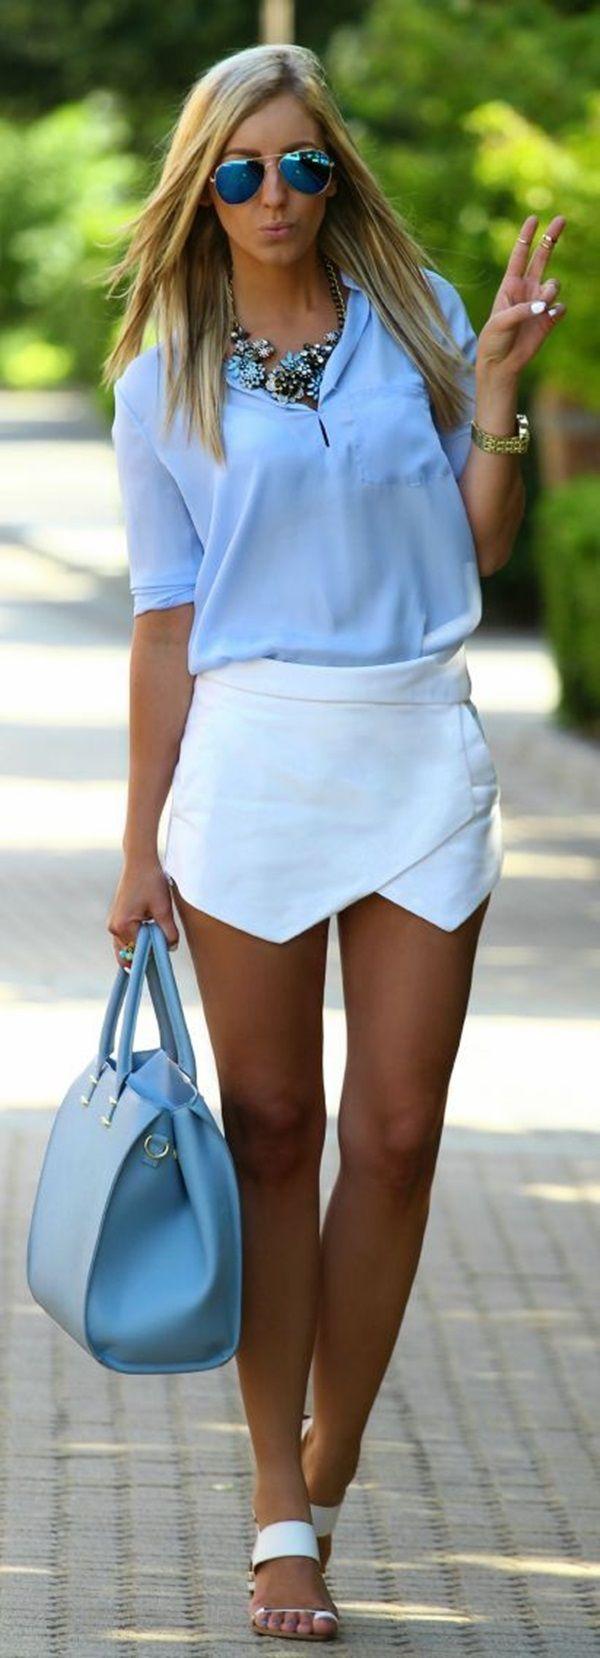 20 best Tobi likes images on Pinterest | Tank tops, Bodycon dress ...